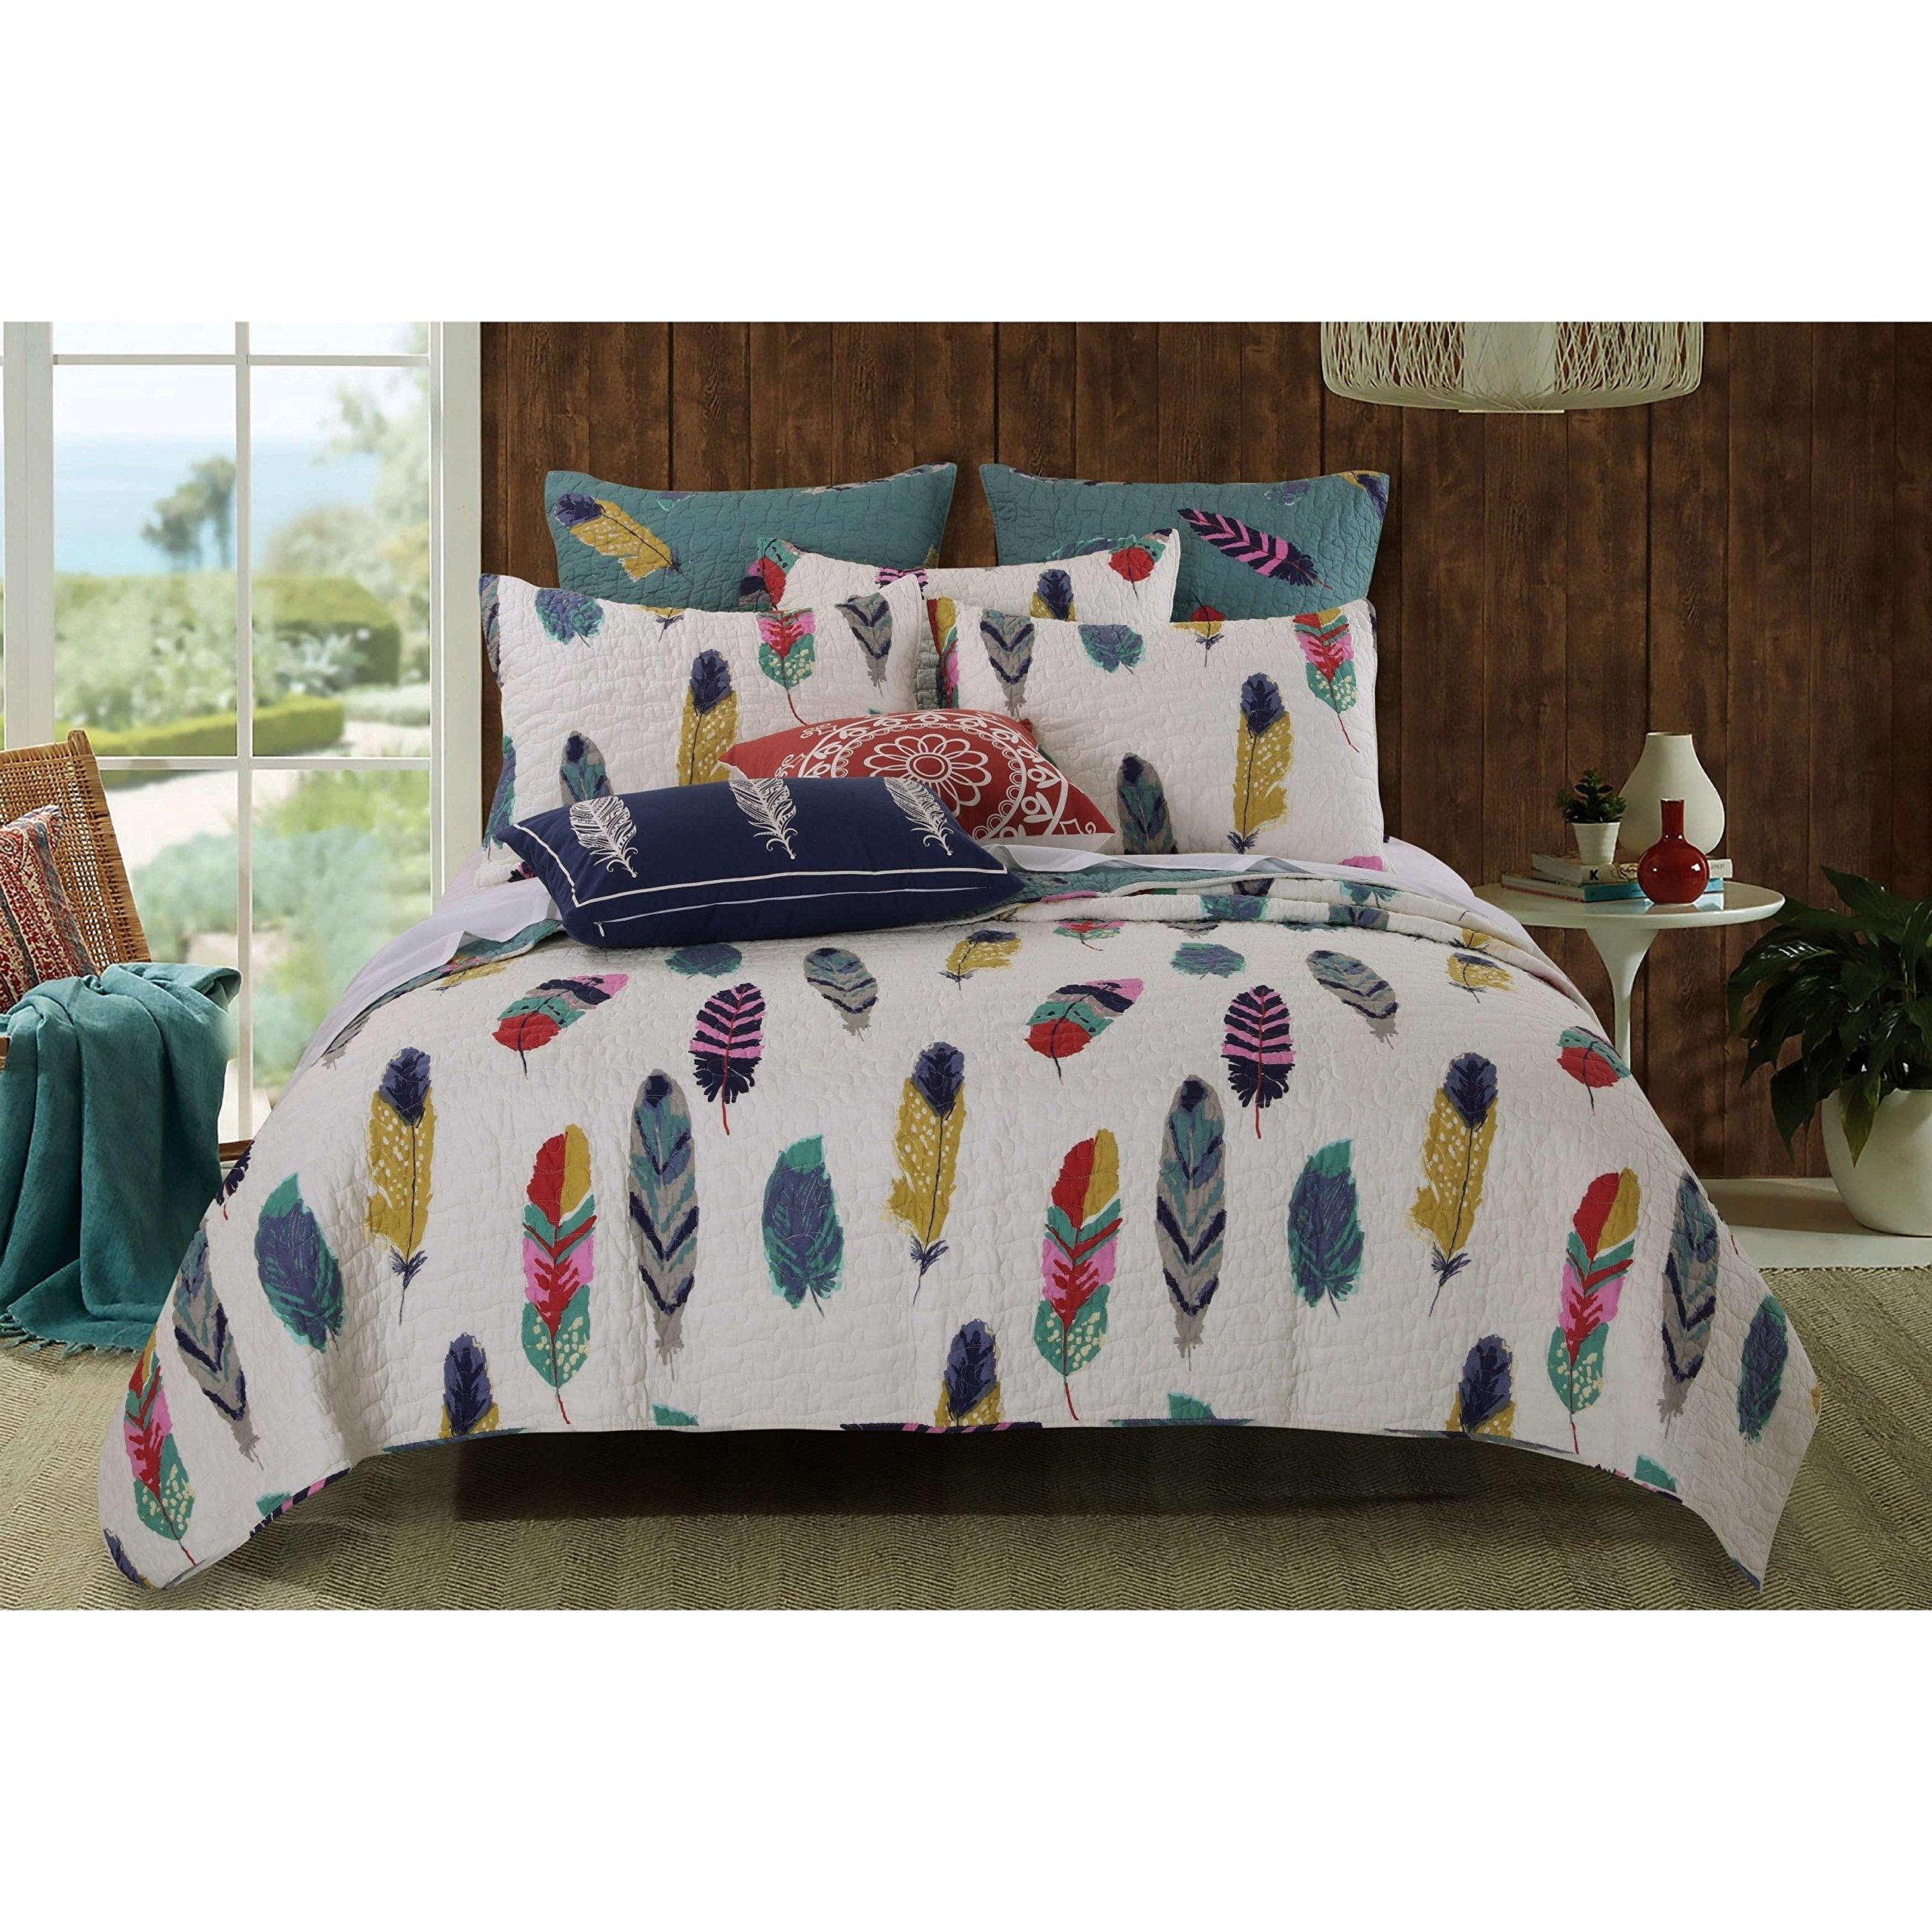 2 Piece Multi Colorful Bird Feathers Quilt Twin Set, Elegant Dream Catcher Design, Blue Animal Motif Print Reverse Bedding, Hippy Indie Boho Chic Style, Natural Splash Colors, Cotton, Polyester